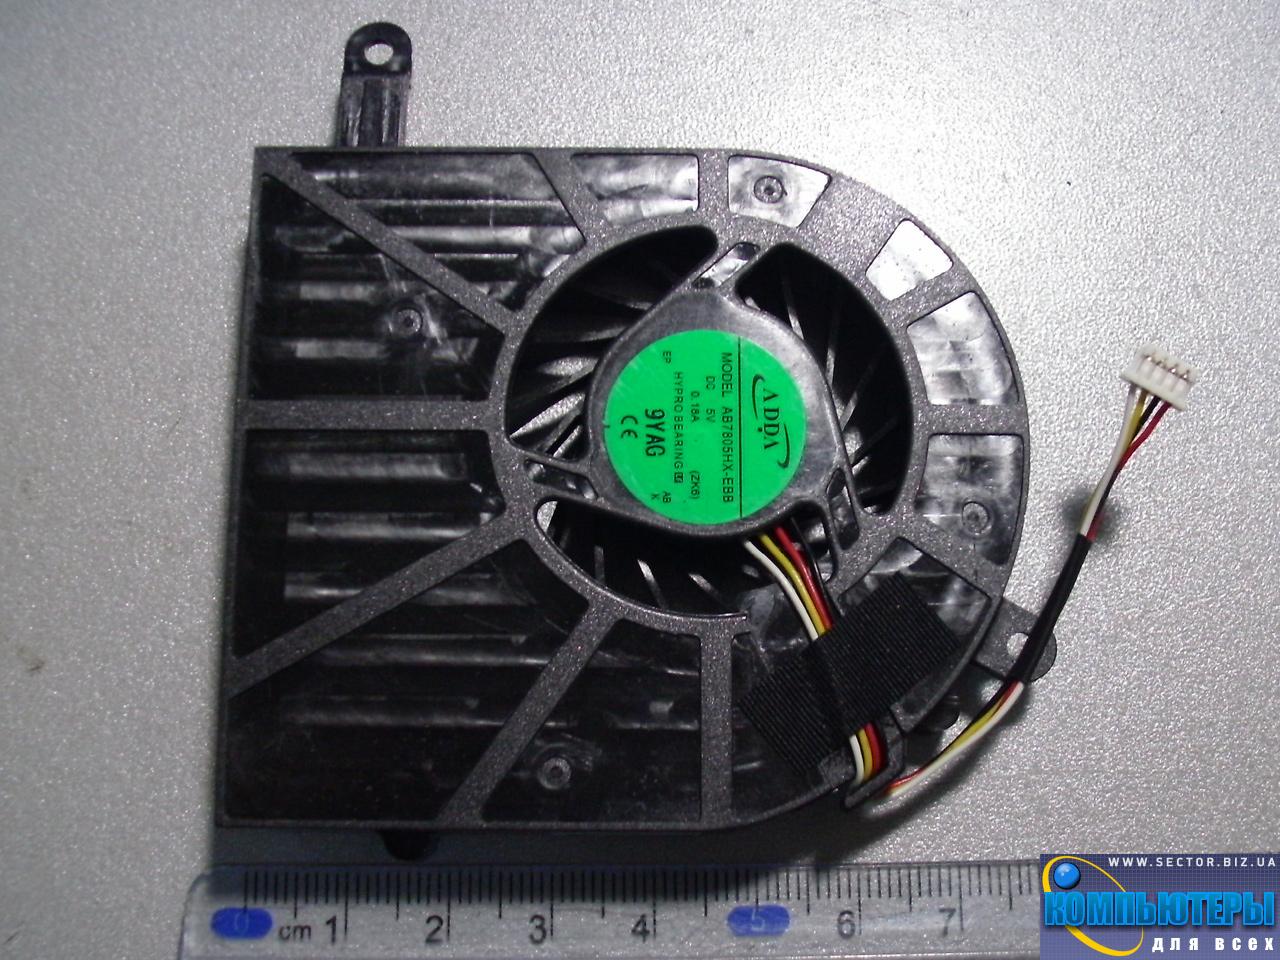 Кулер к ноутбуку Acer Aspire 5739 5739G p/n: AB7805HX-EBB (ZK6). Фото № 1.